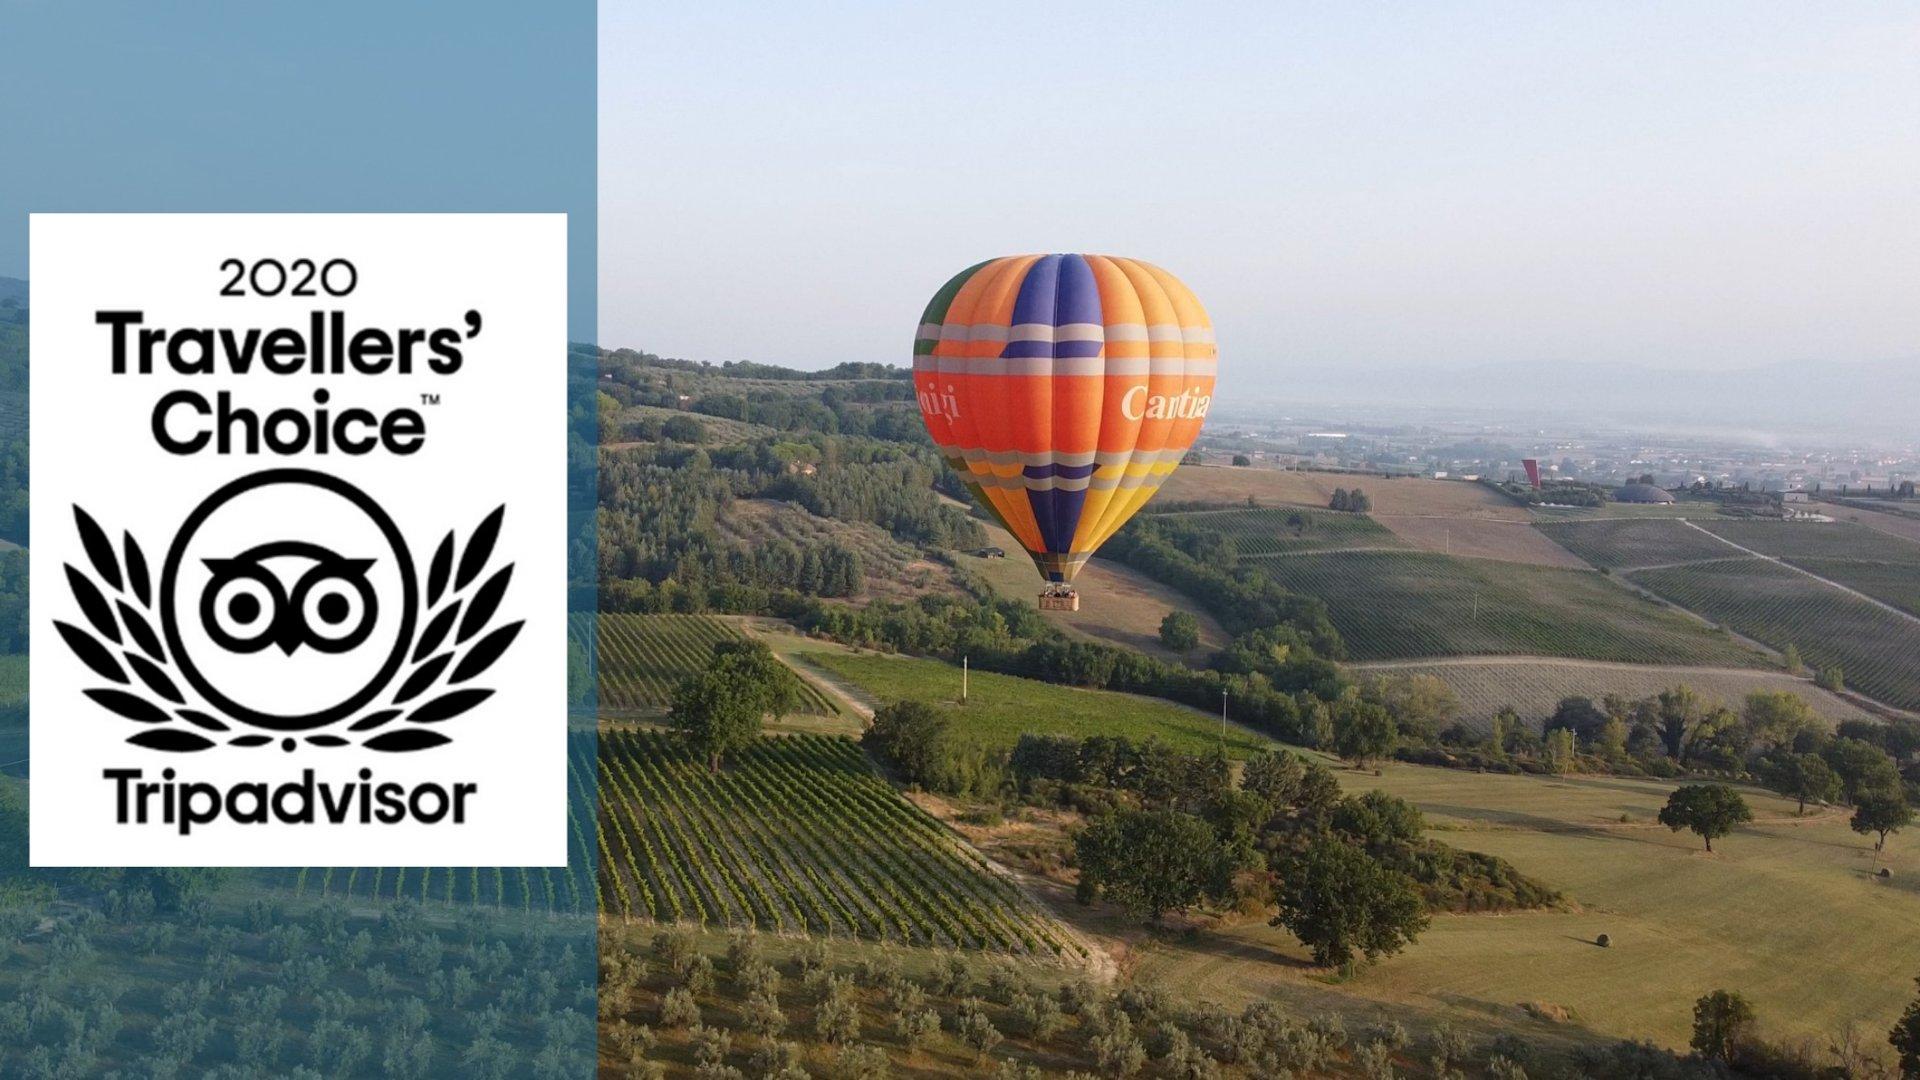 Balloon Adventures Italy ha vinto il Travellers' Choice